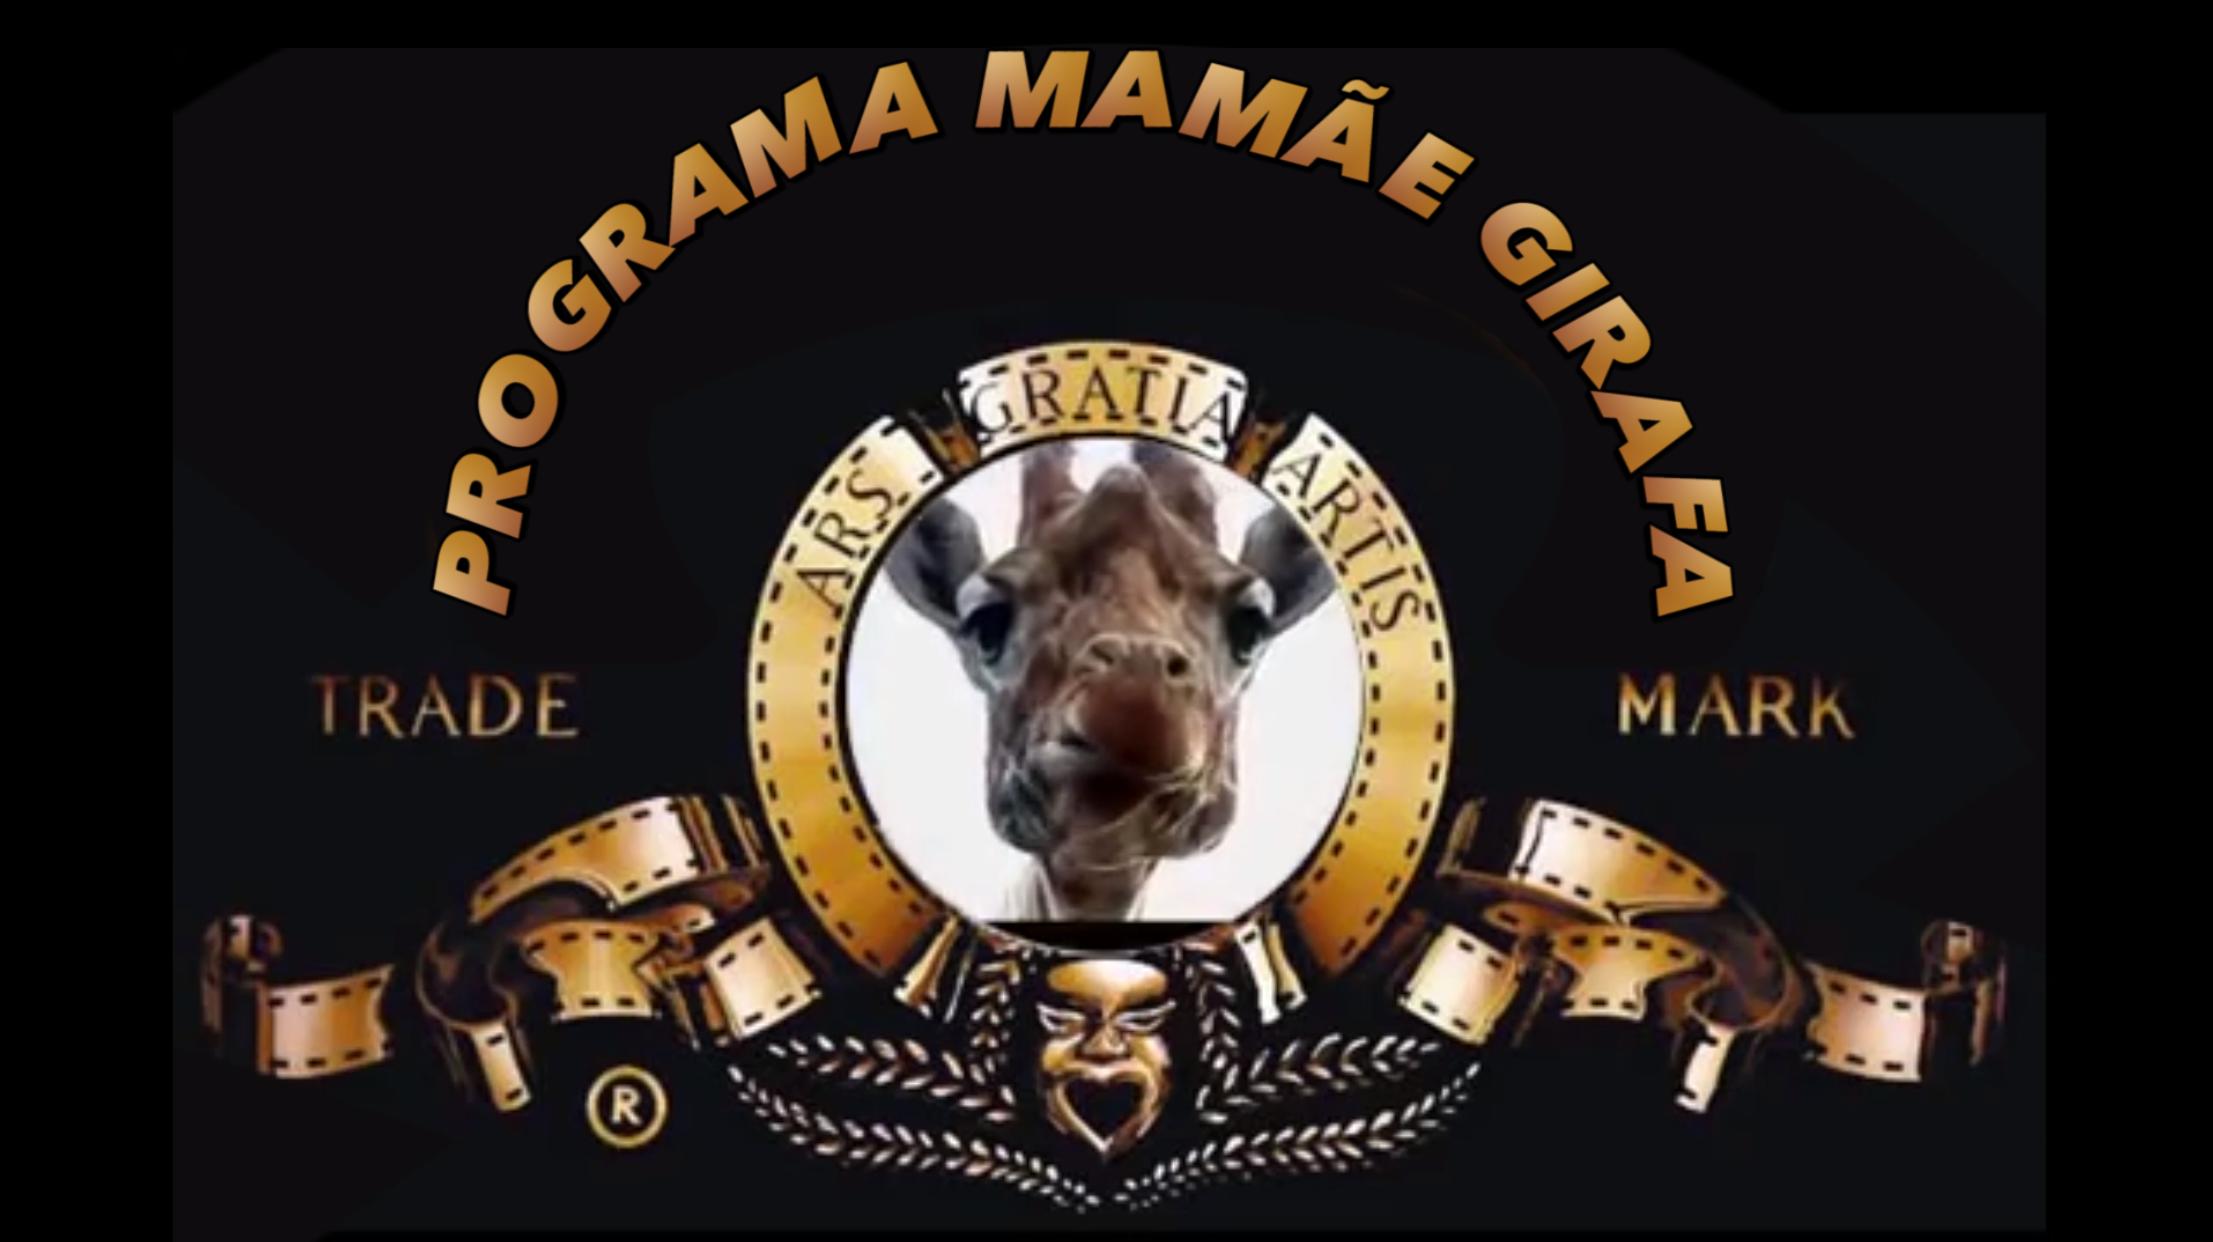 MAMAE GIRAFA PRESENTES --.07.19 (1)